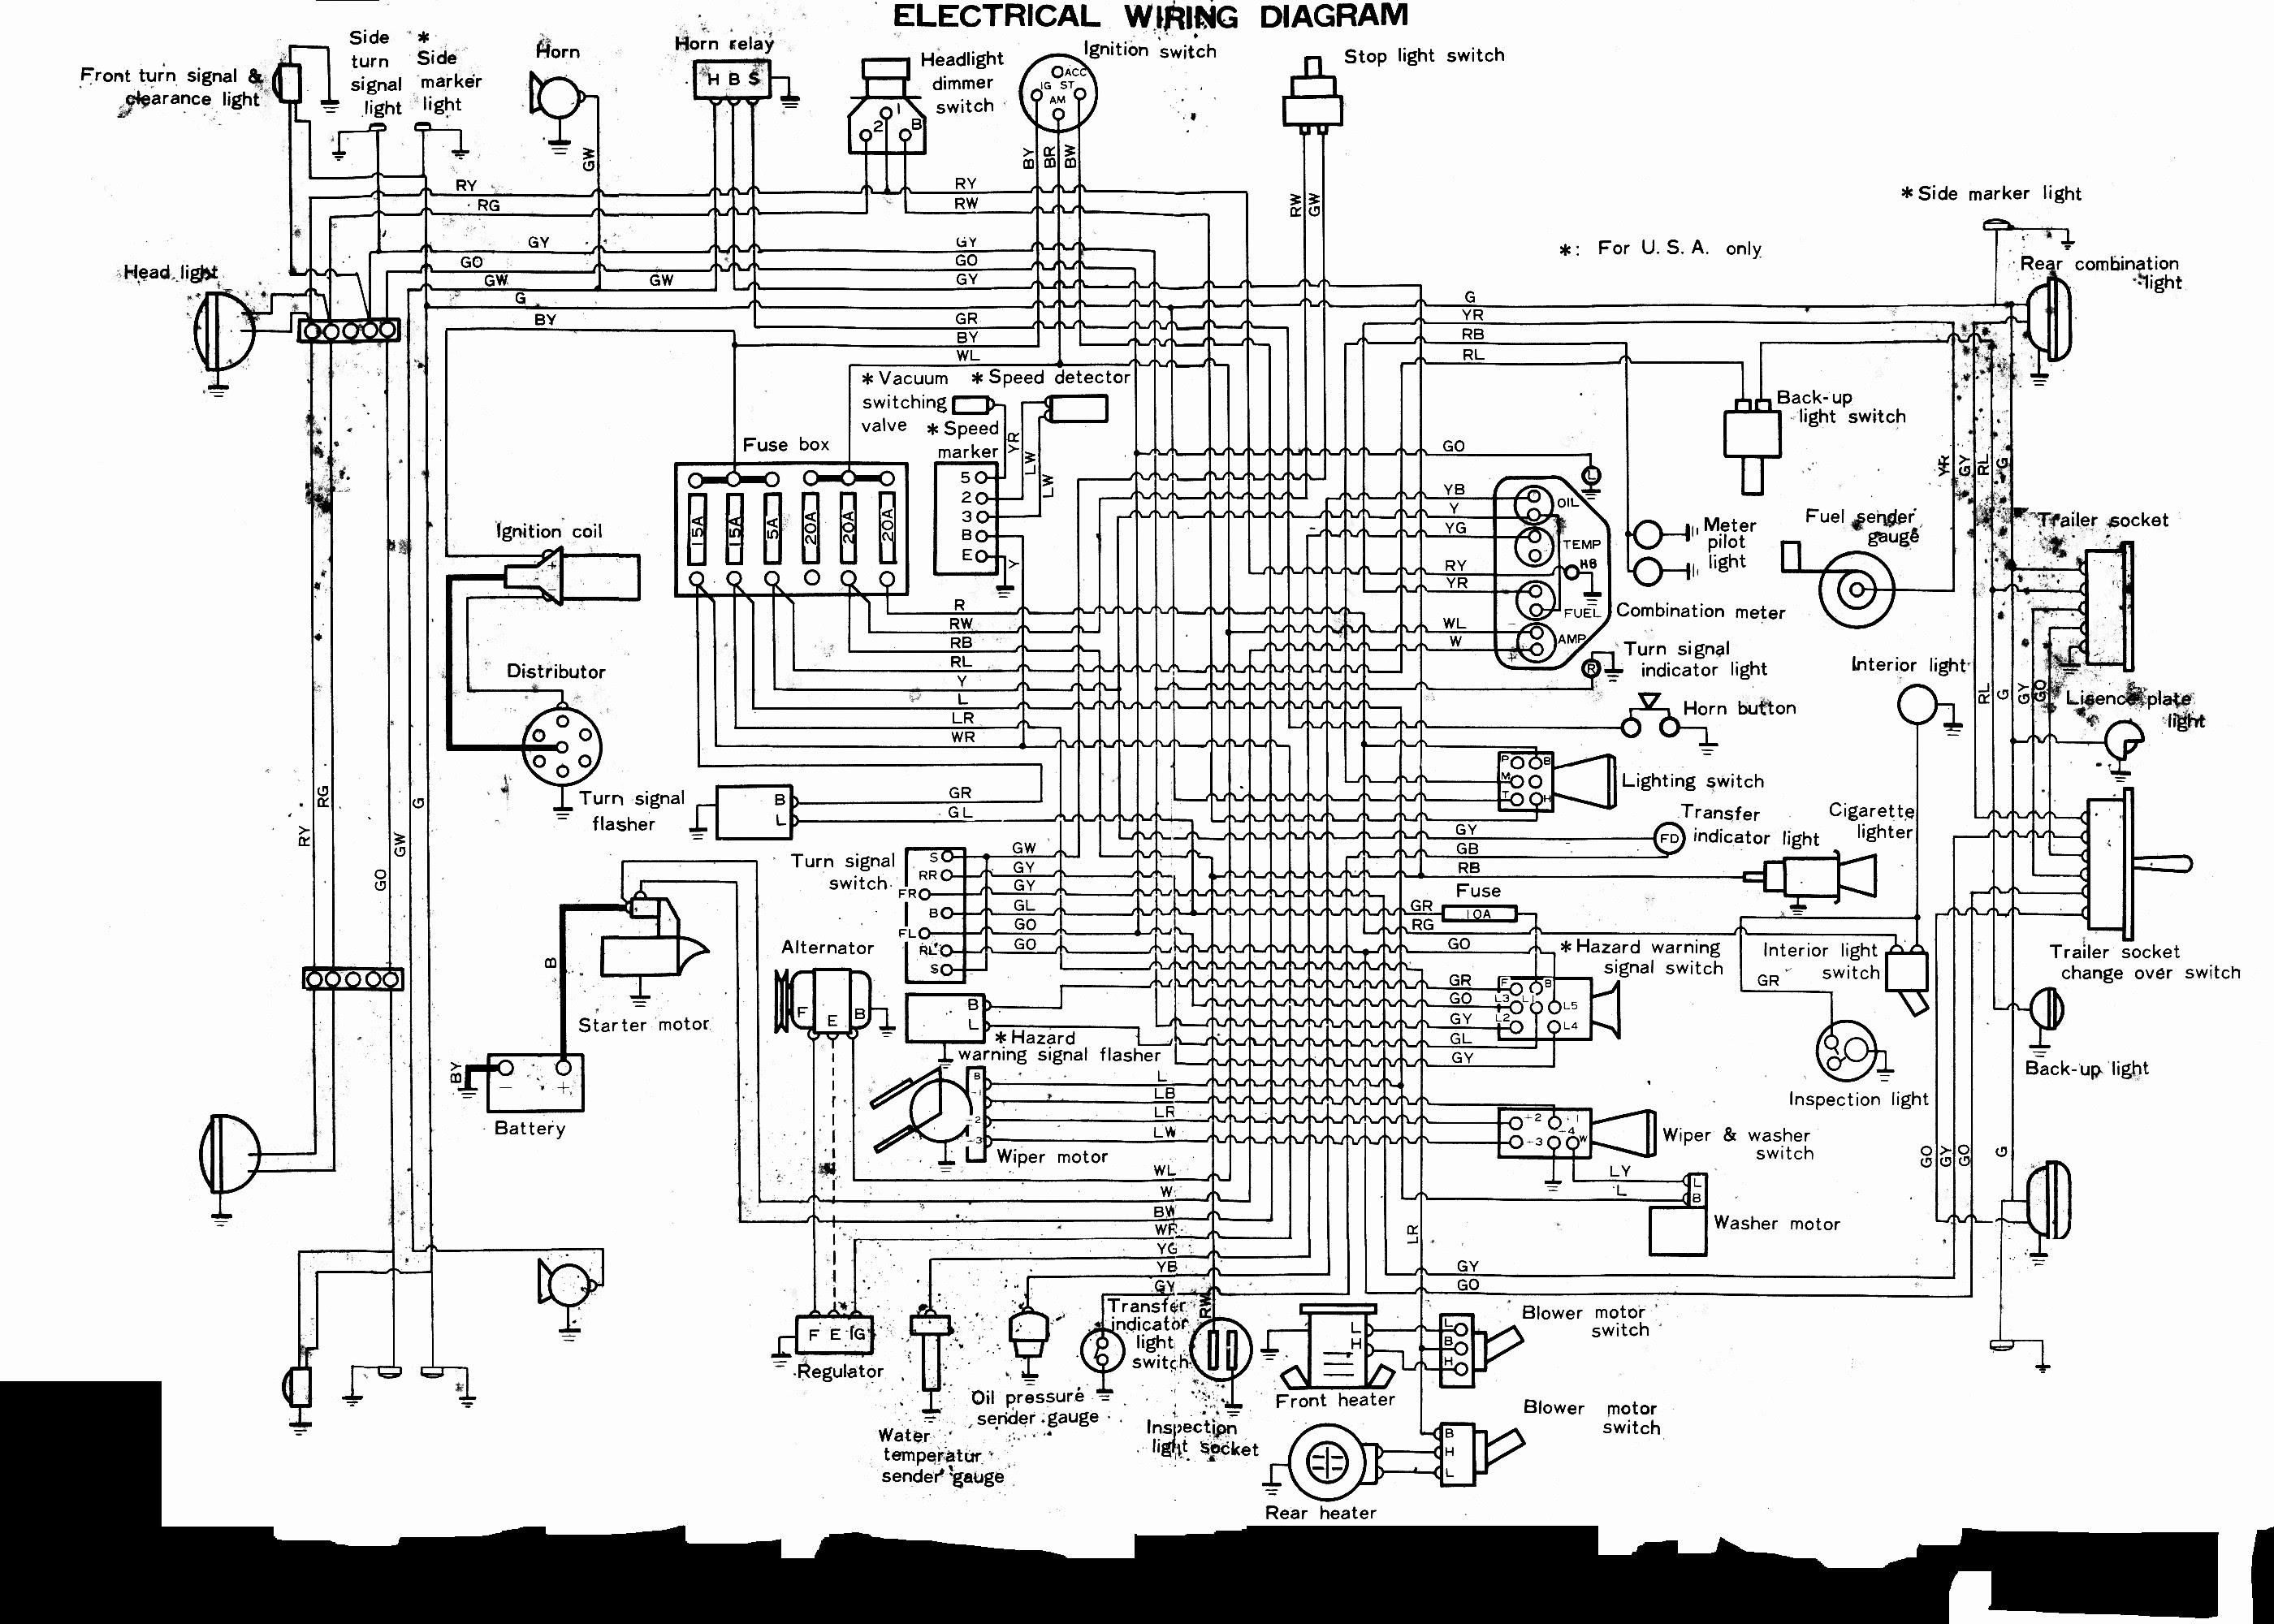 Chrysler Sebring Wiring Diagram Wiring Diagram System Ill Locate A Ill Locate A Ediliadesign It